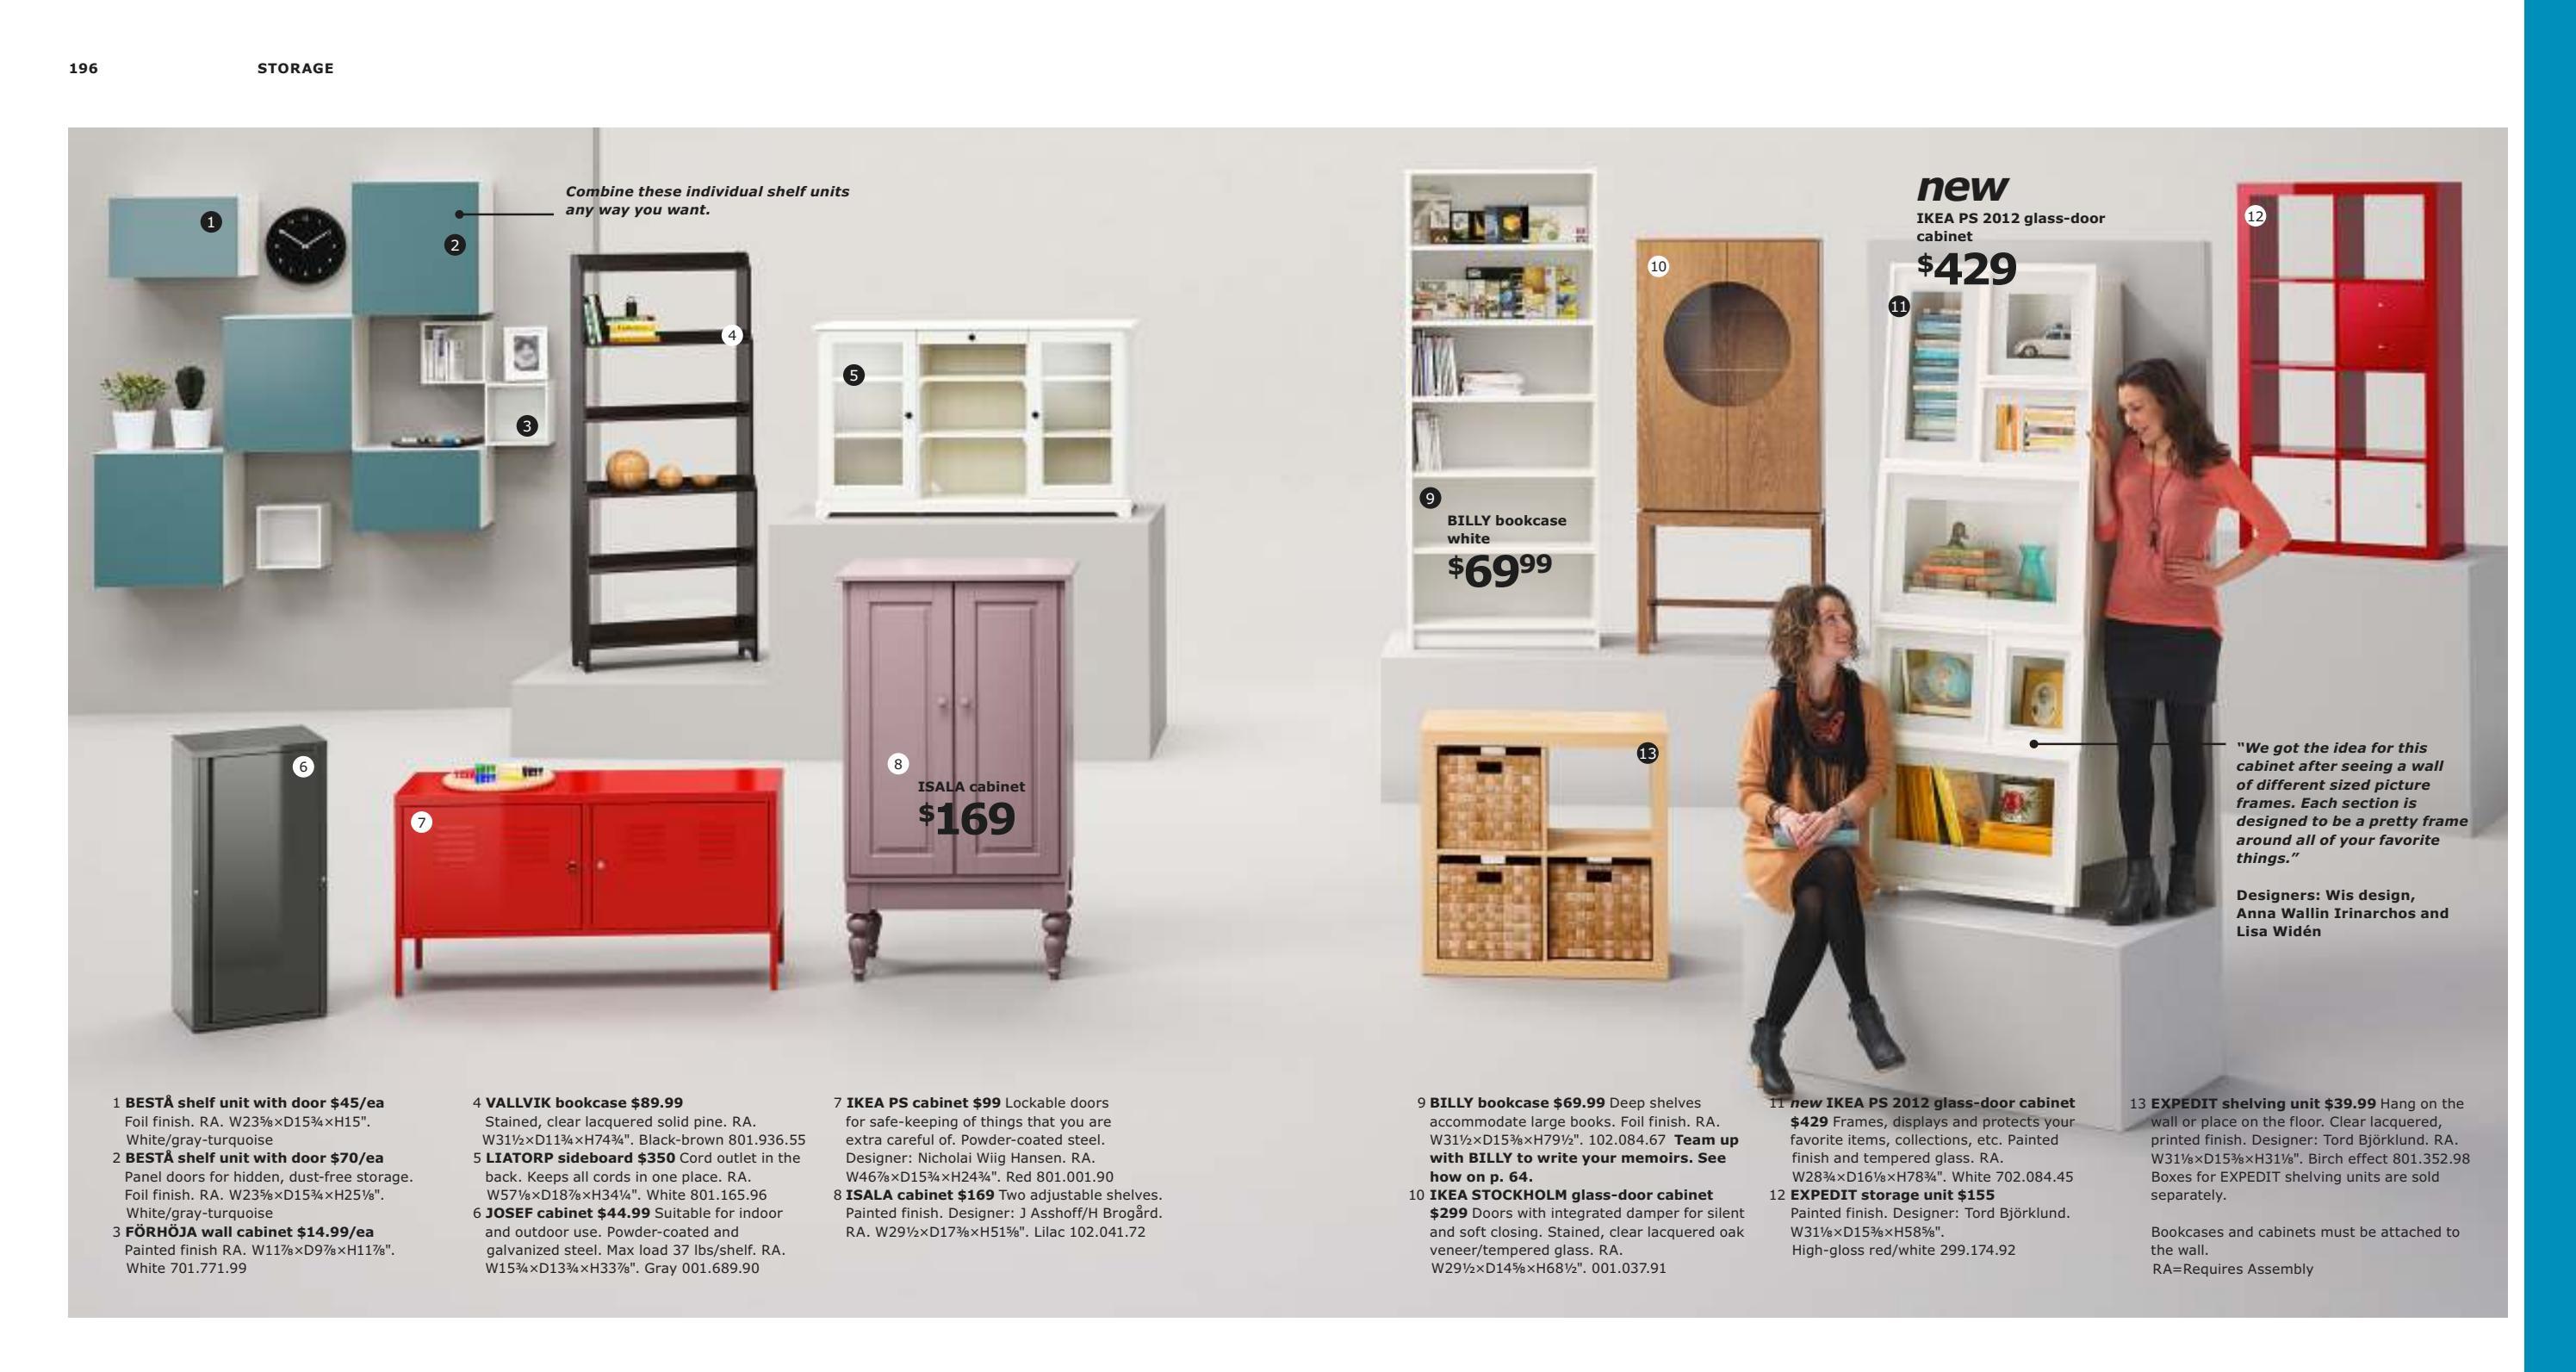 Ikea Catalog 2013 Us By Eilier Decor Issuu